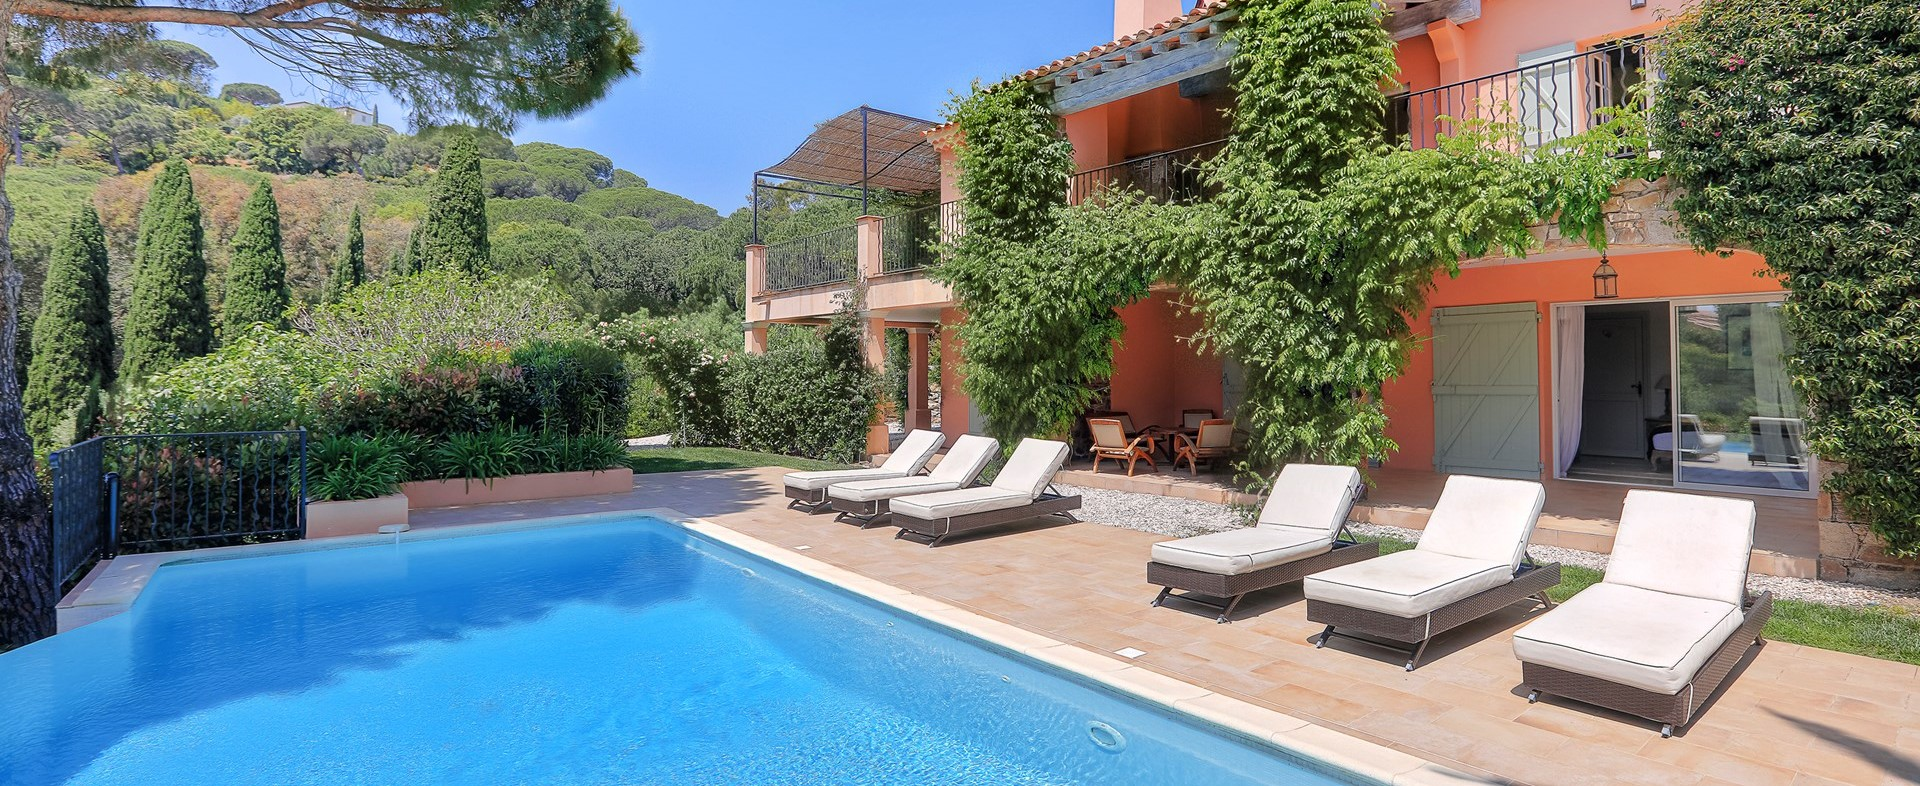 luxury-3-bedroom-villa-cote-d-azur